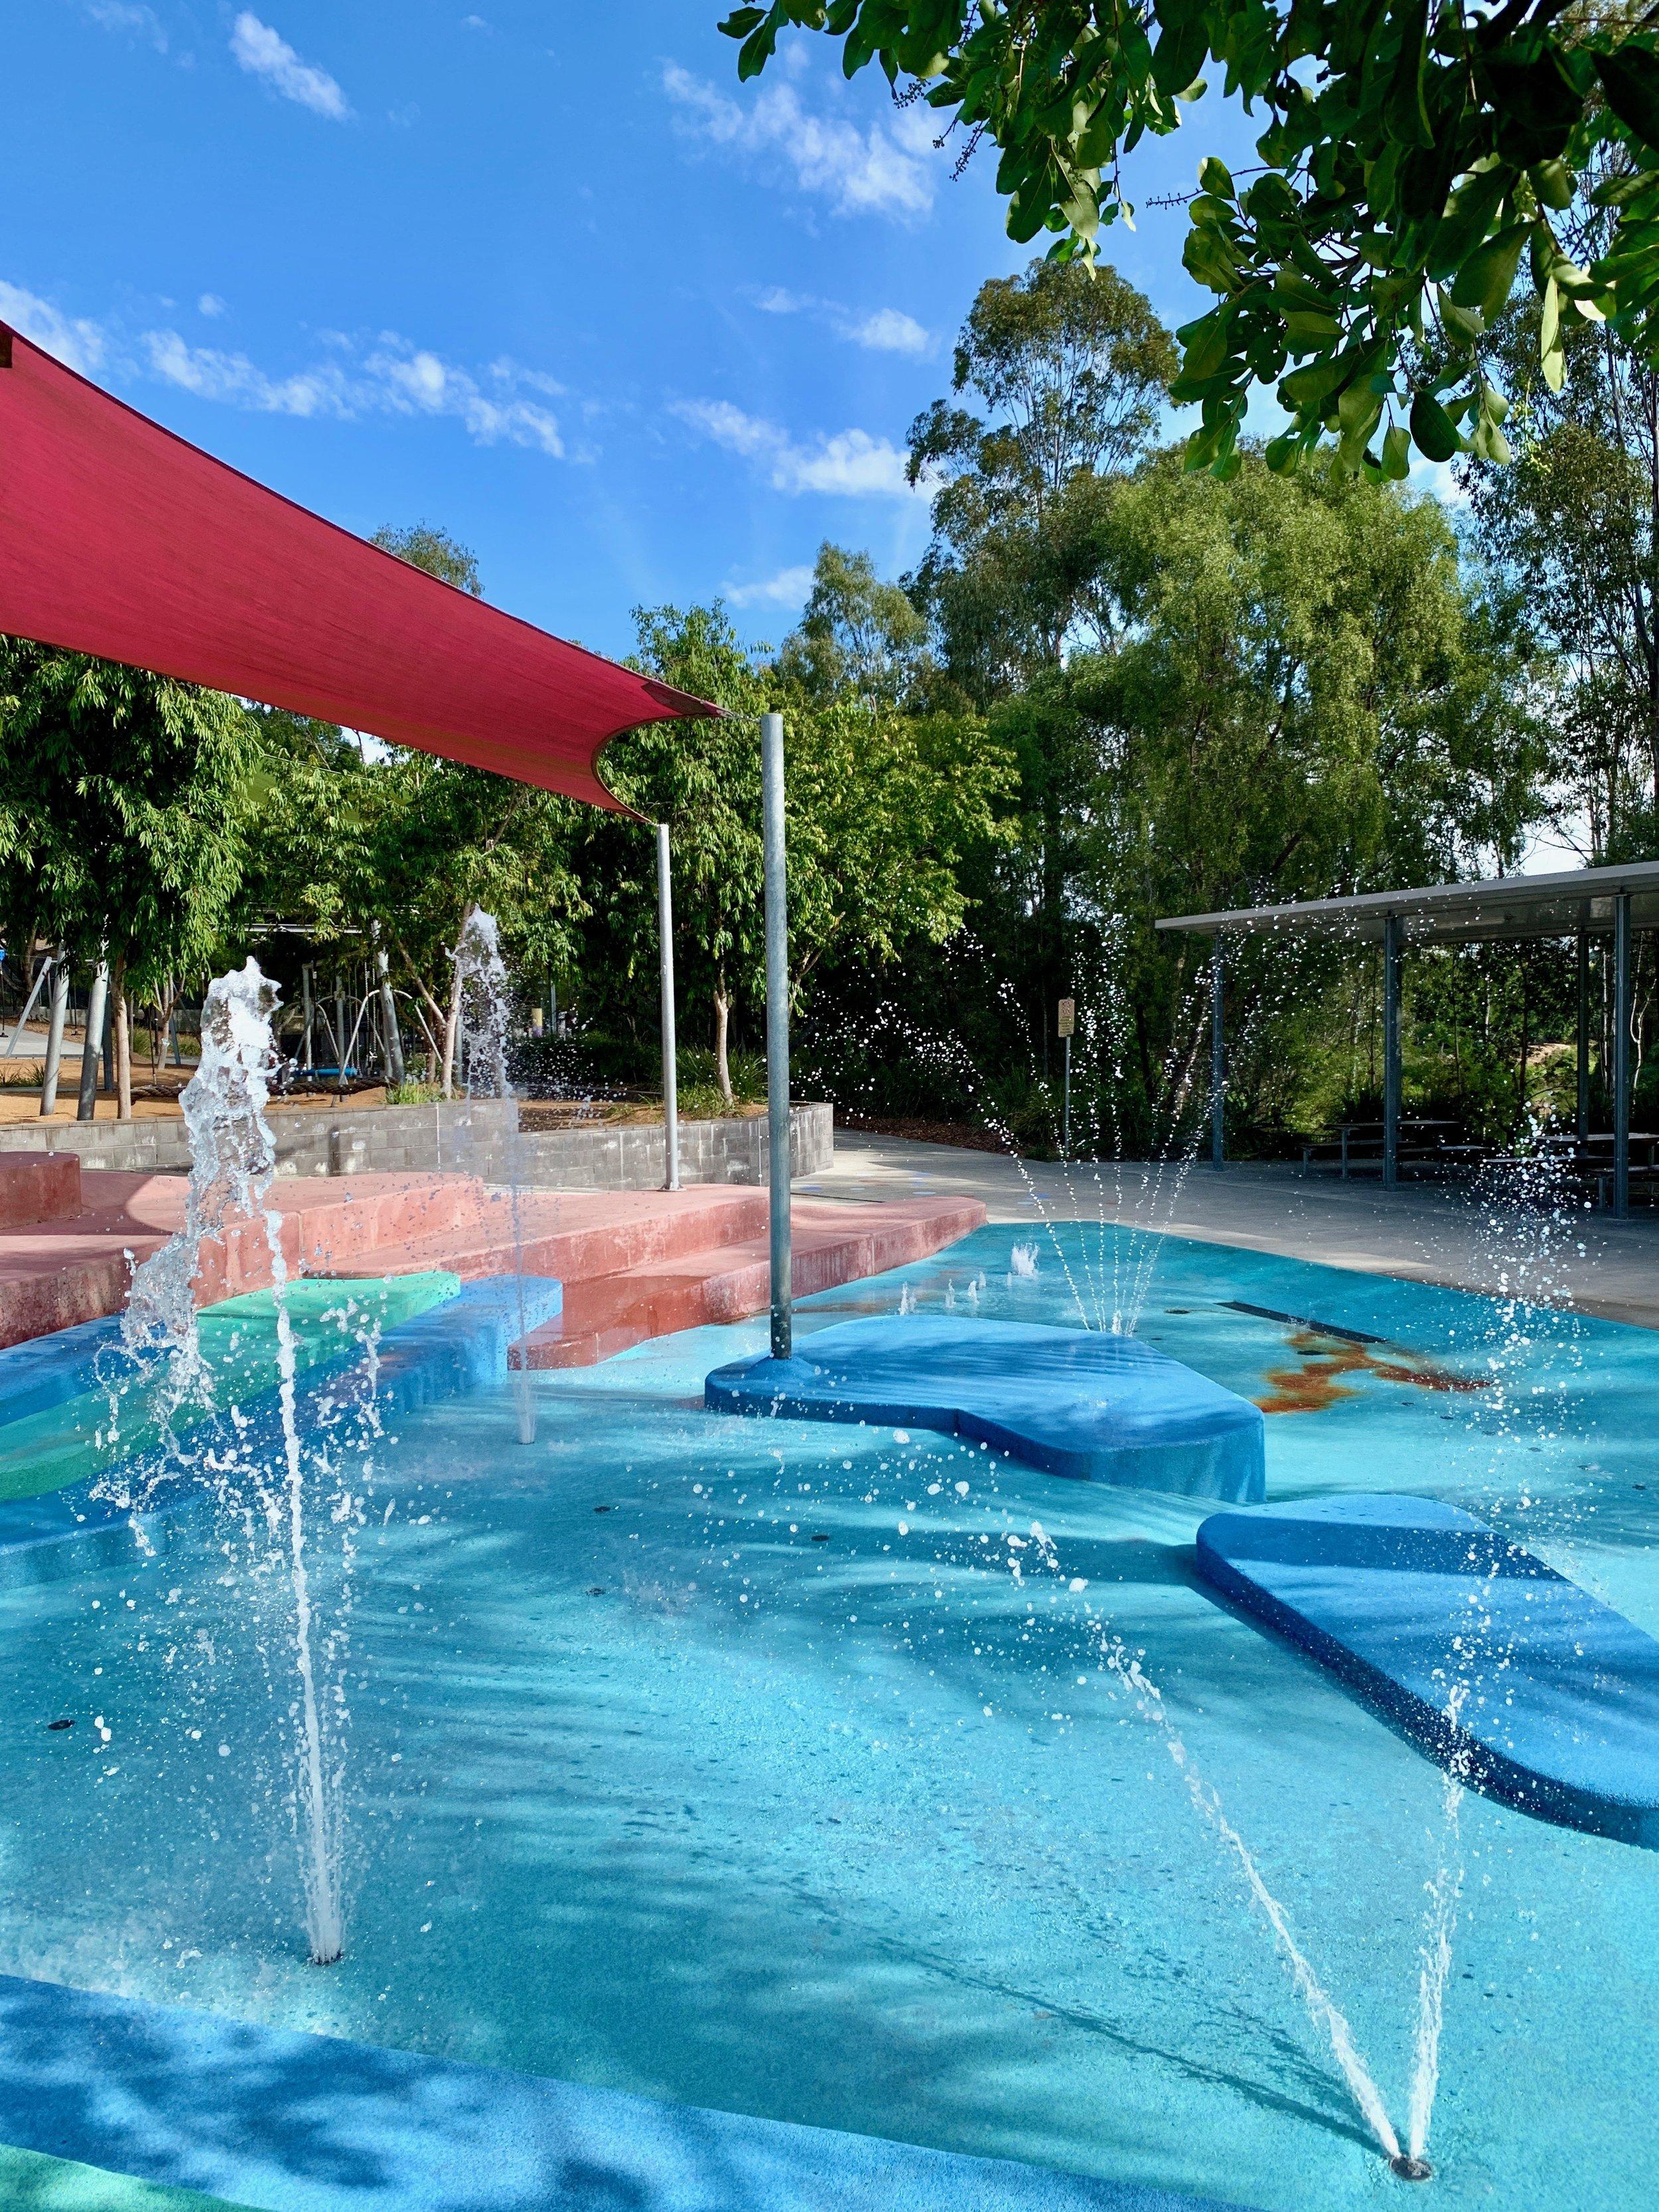 Lady Brisbane Bob Gamble water park Ipswich